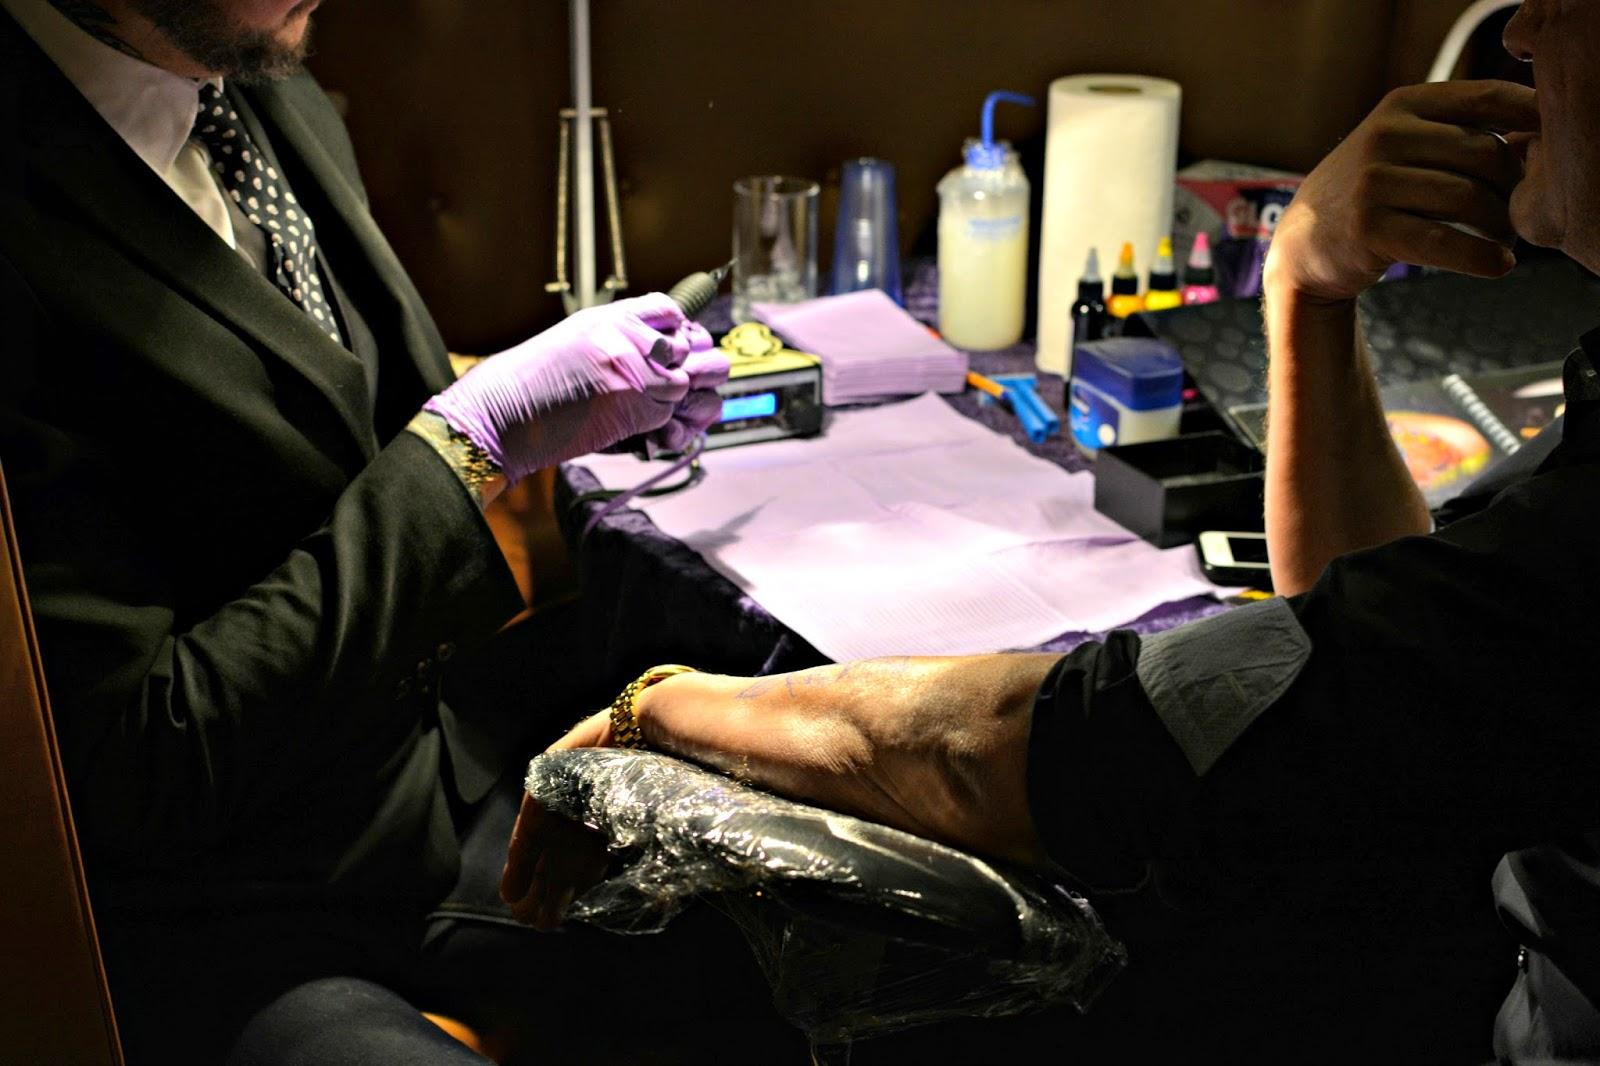 Live tattooist at Sanctum Soho Guirado Design event